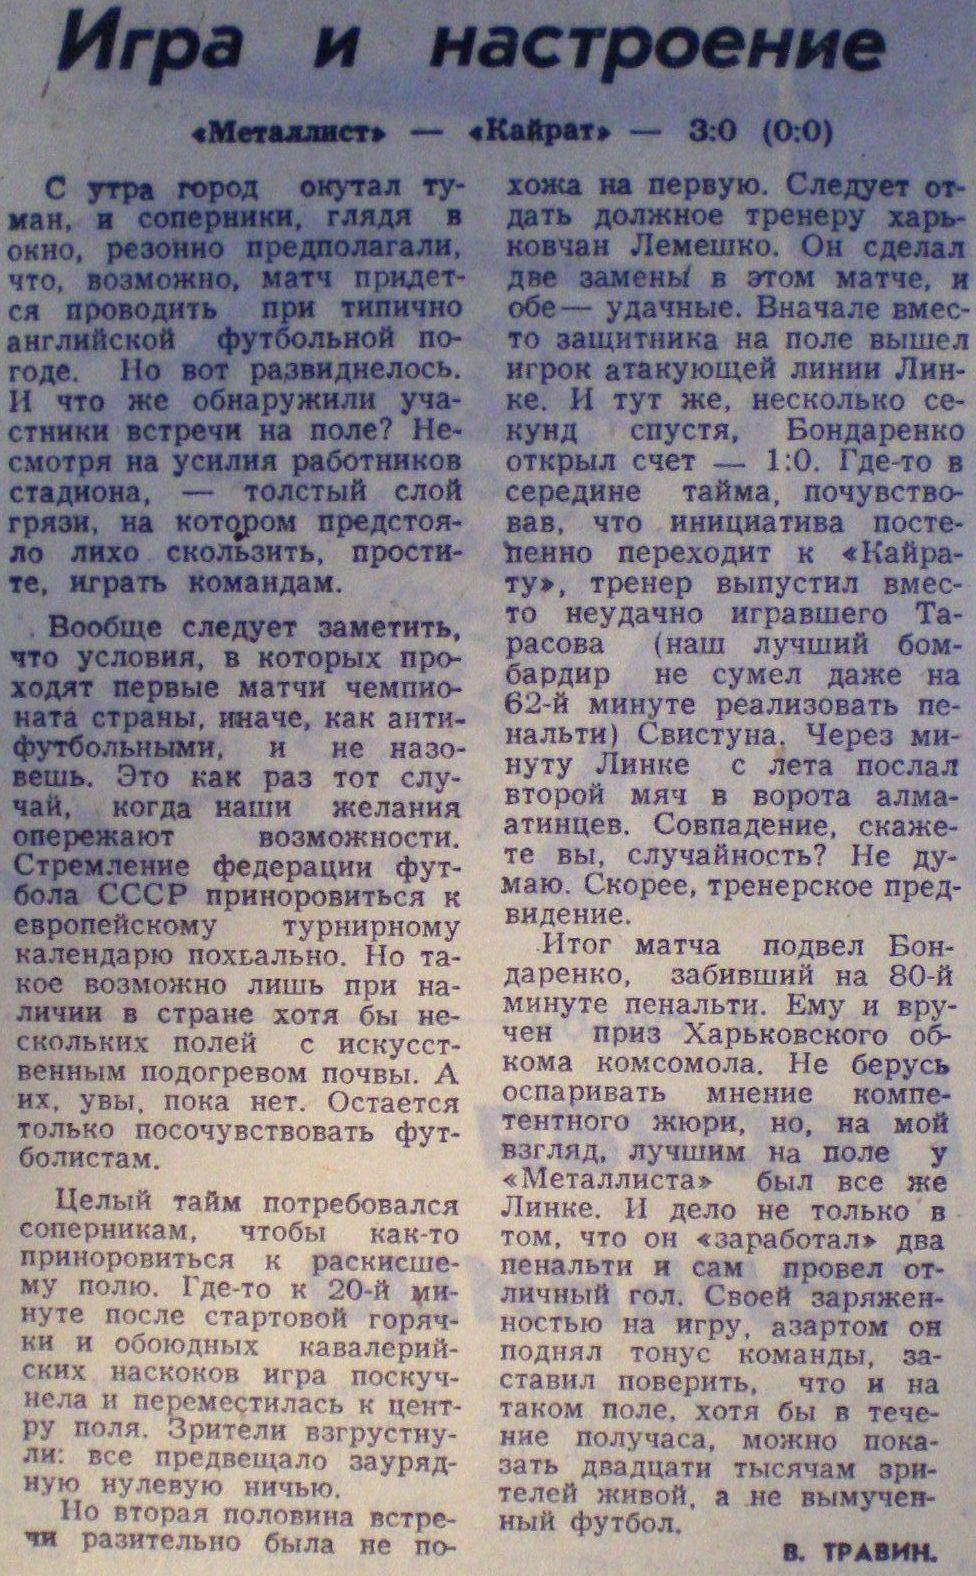 [Изображение: 1985-03-17_MKh-KA_3-0_KZ.jpg]